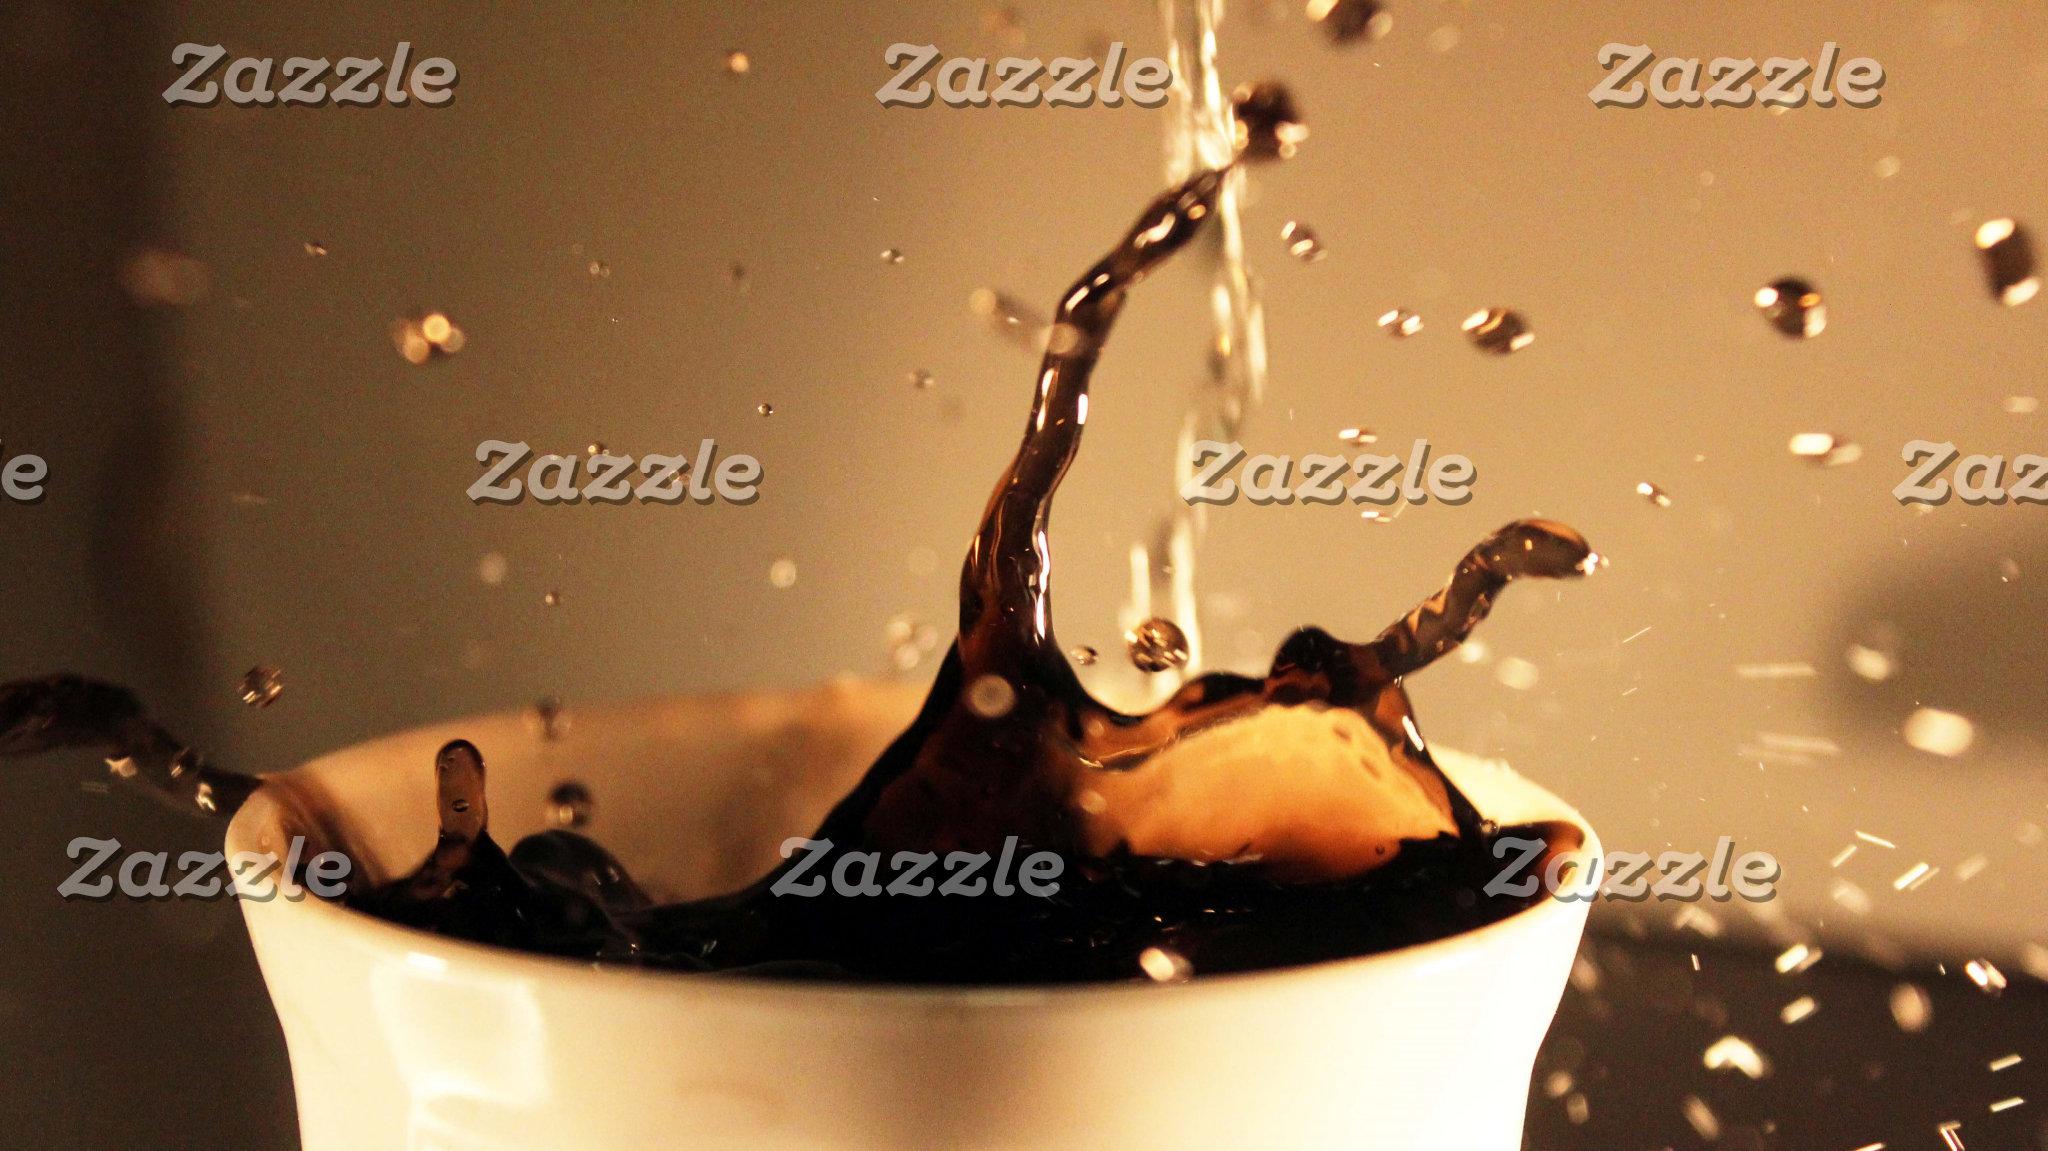 Coffee Splashes